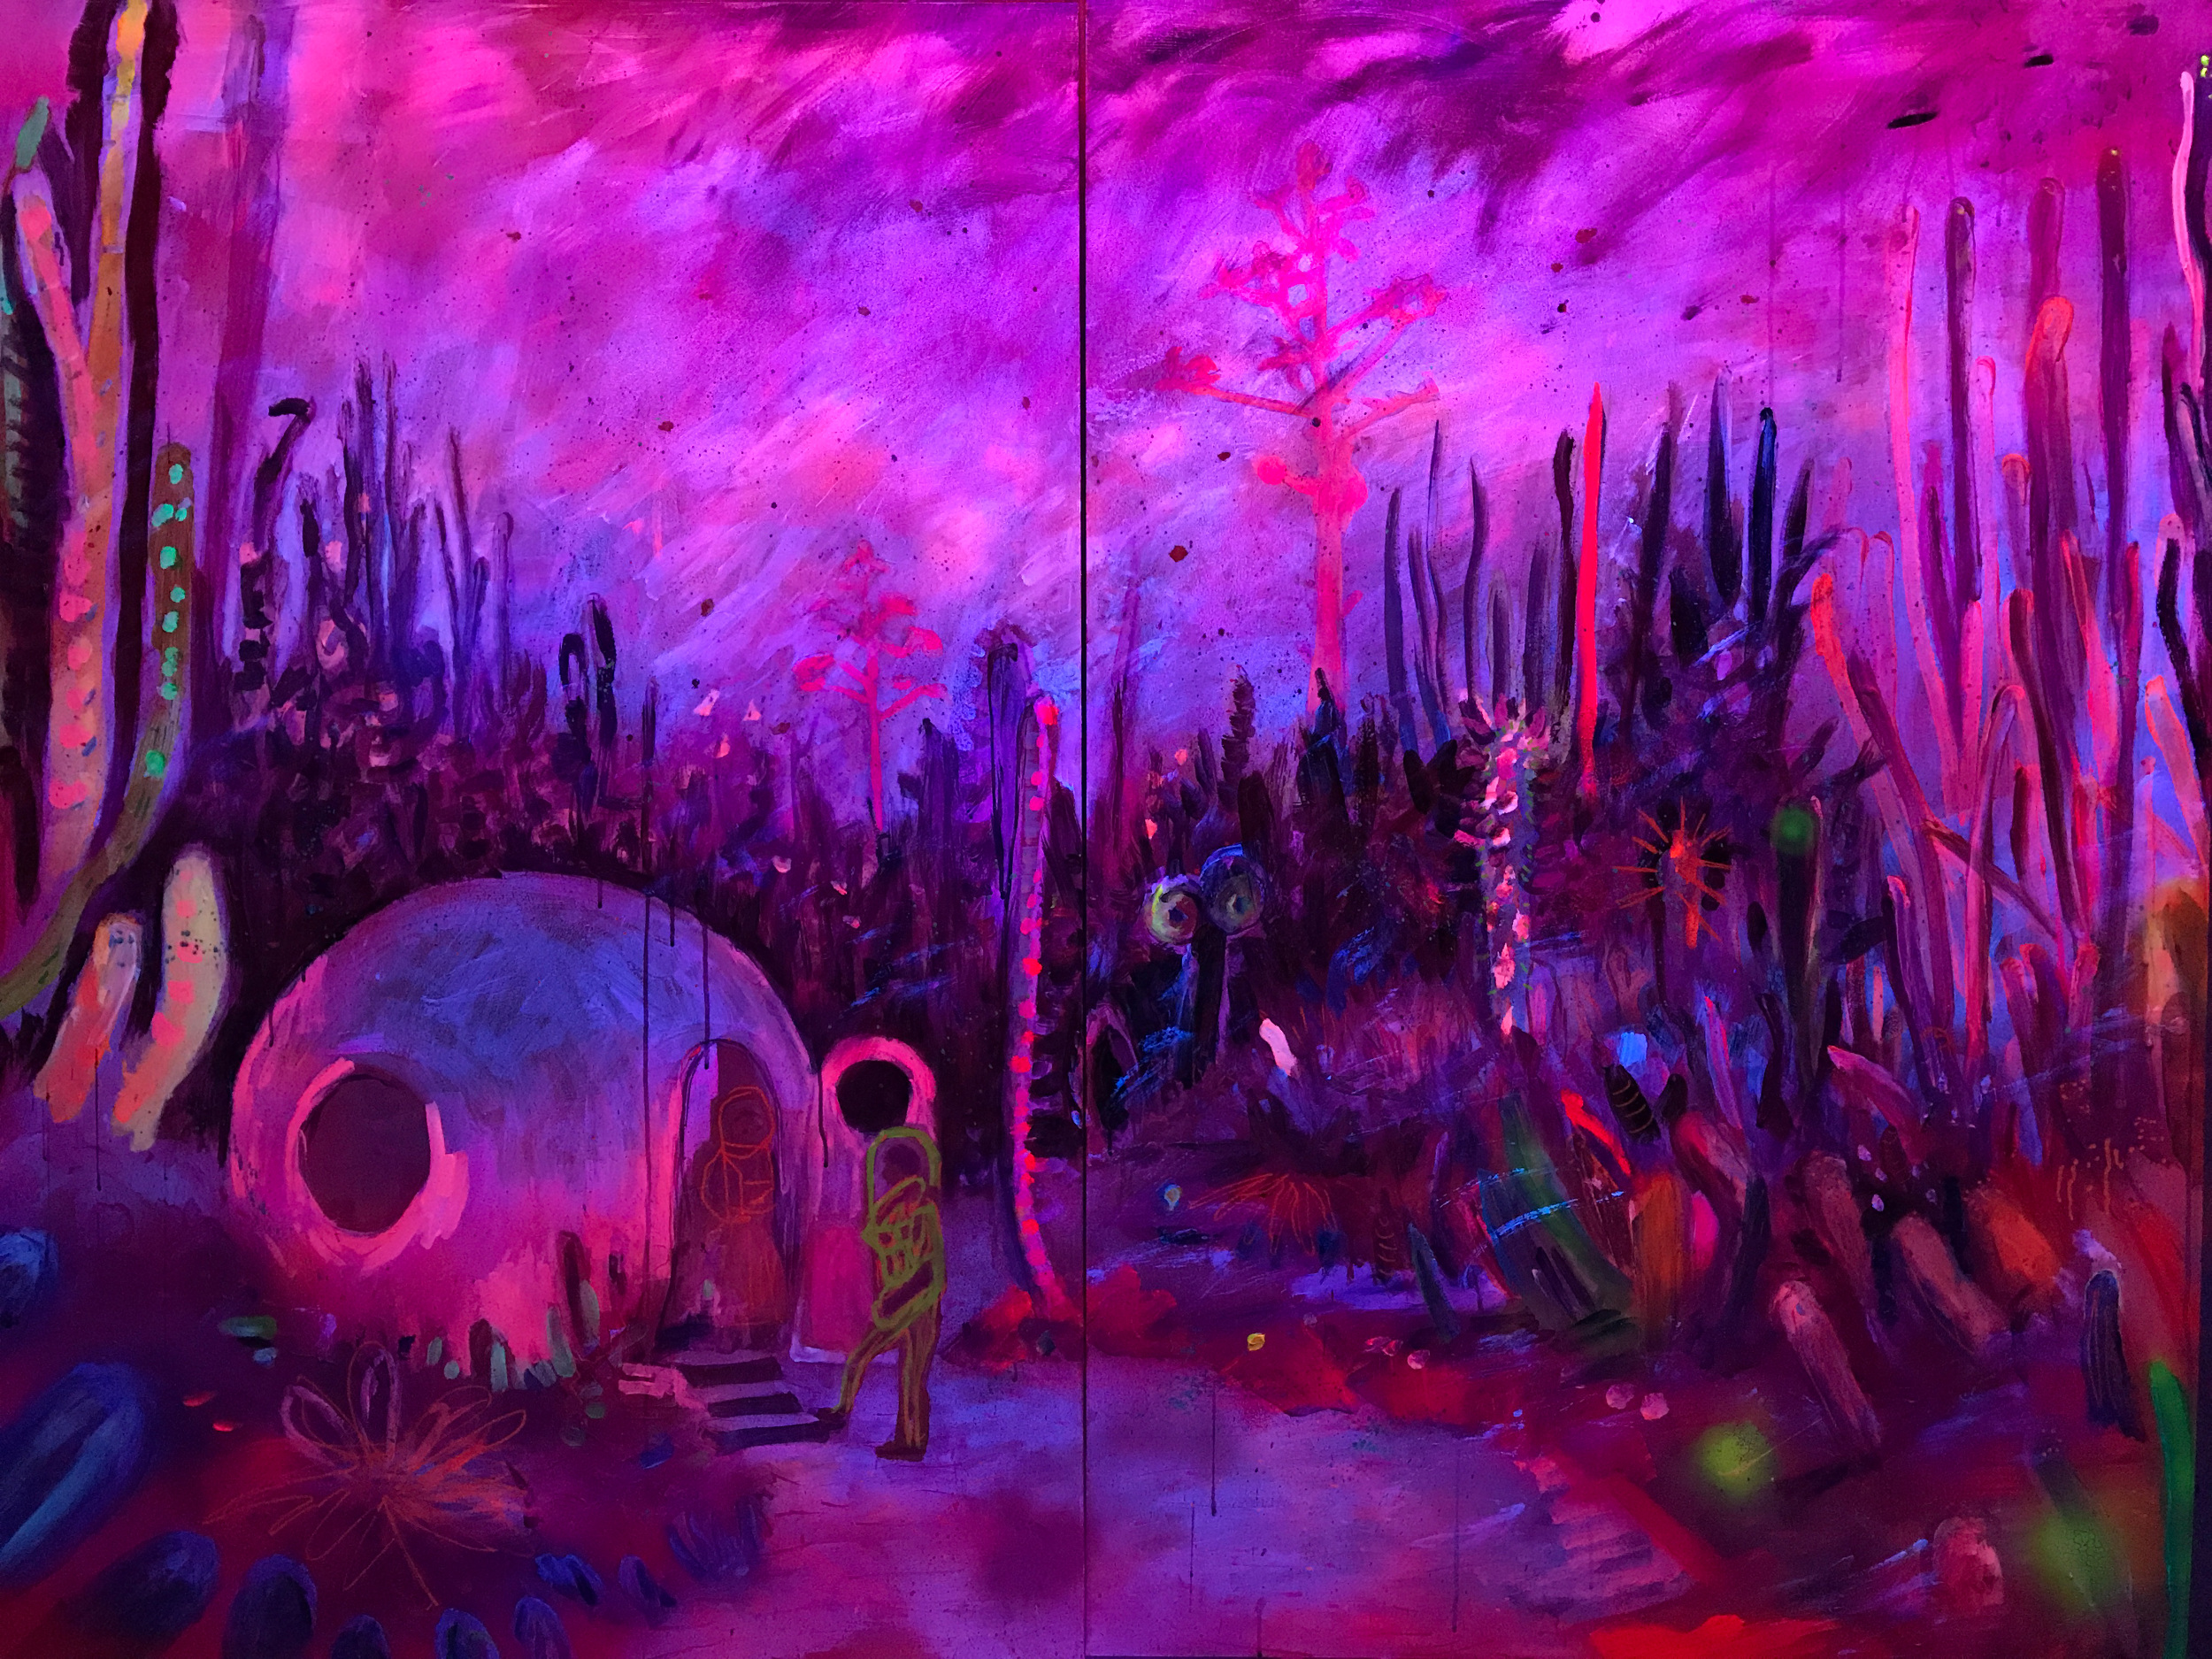 #otherworlds, 2017, ultraviolet light, posca pen, acrylic, fluorescent and aerosol paint on board, 1.5 x 2m (ultraviolet light view)